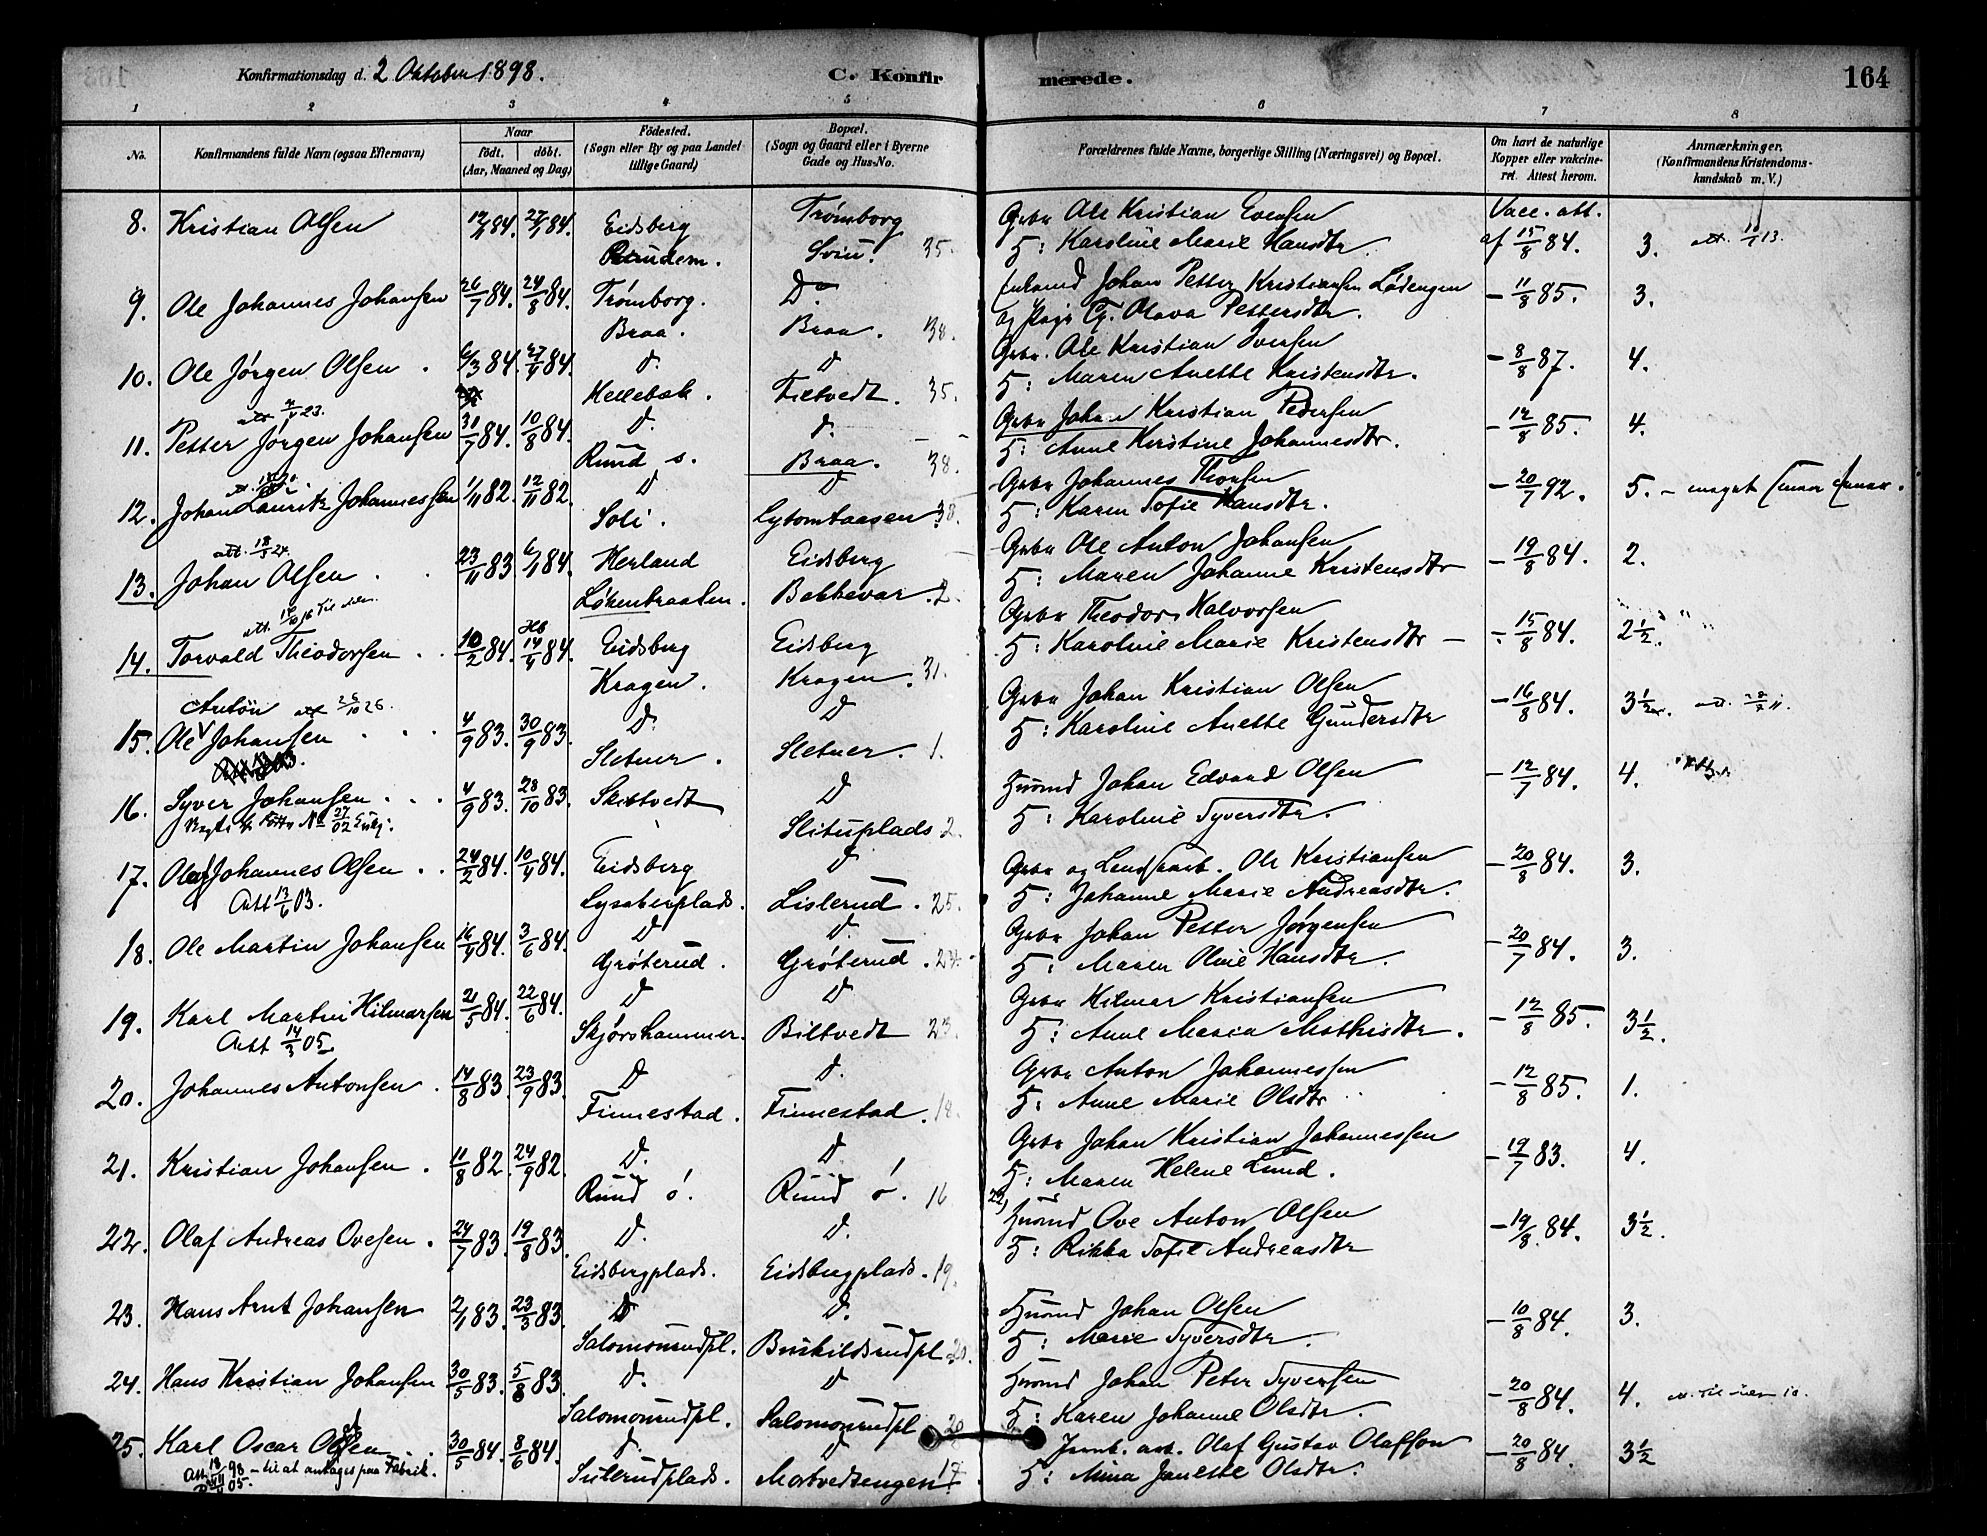 SAO, Eidsberg prestekontor Kirkebøker, F/Fa/L0012: Ministerialbok nr. I 12, 1879-1901, s. 164